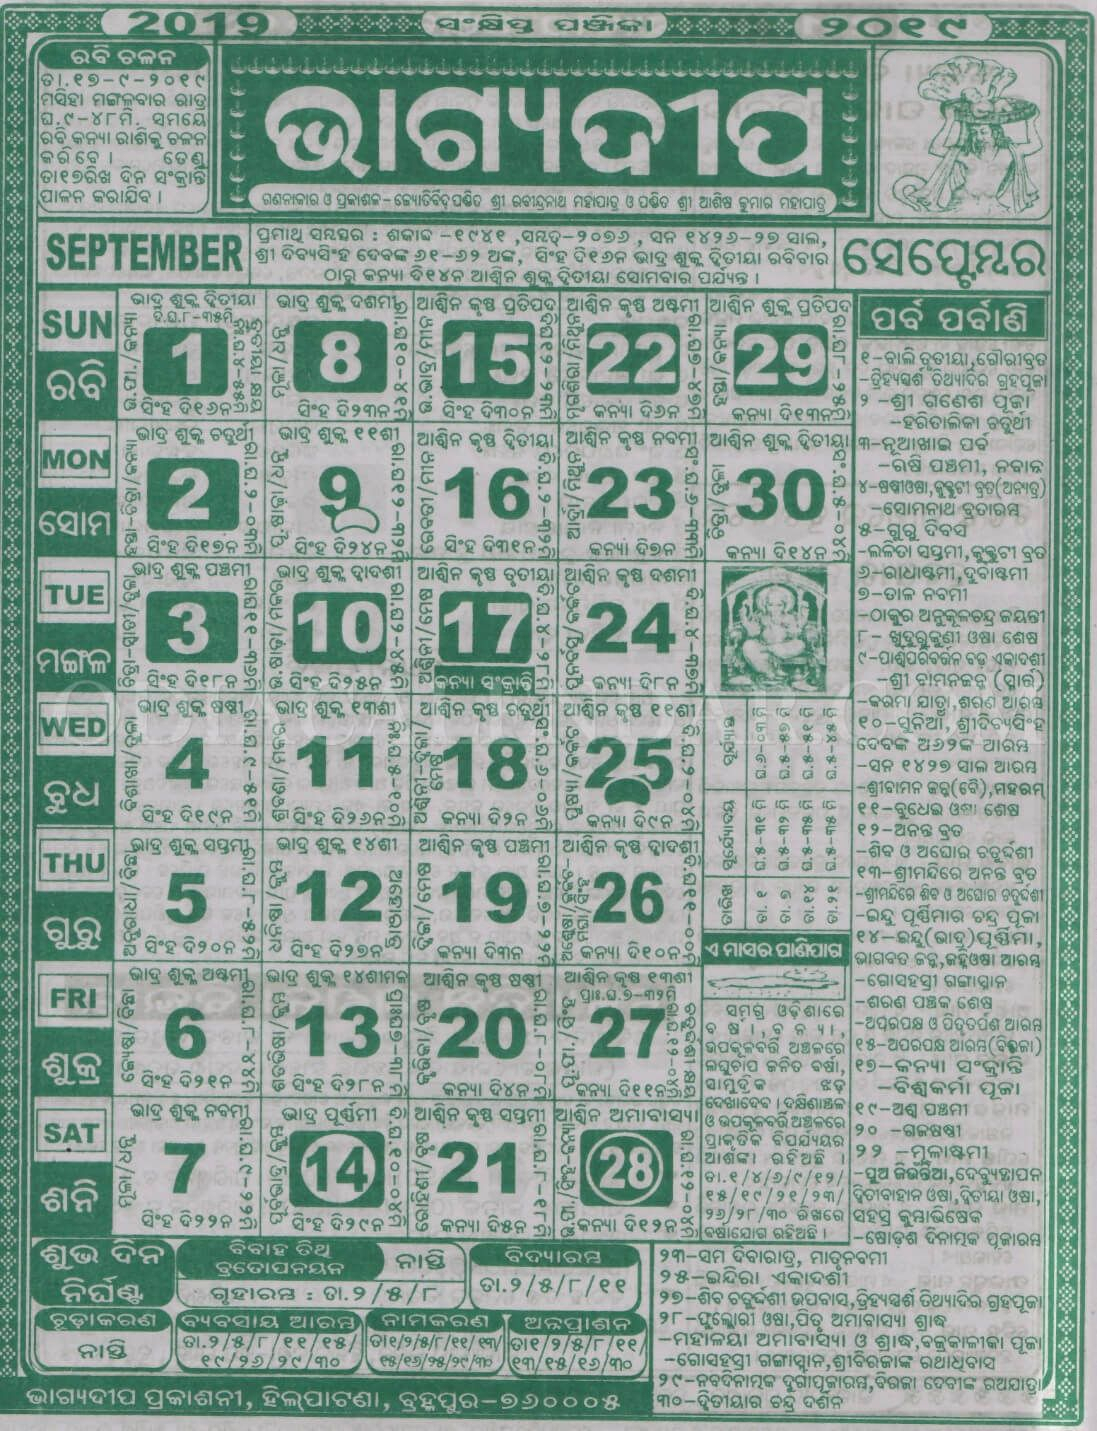 Bhagyadeep Calendar September 2019 | Calendar, App, December pertaining to Bhagyadeep Odia Calendar 2020